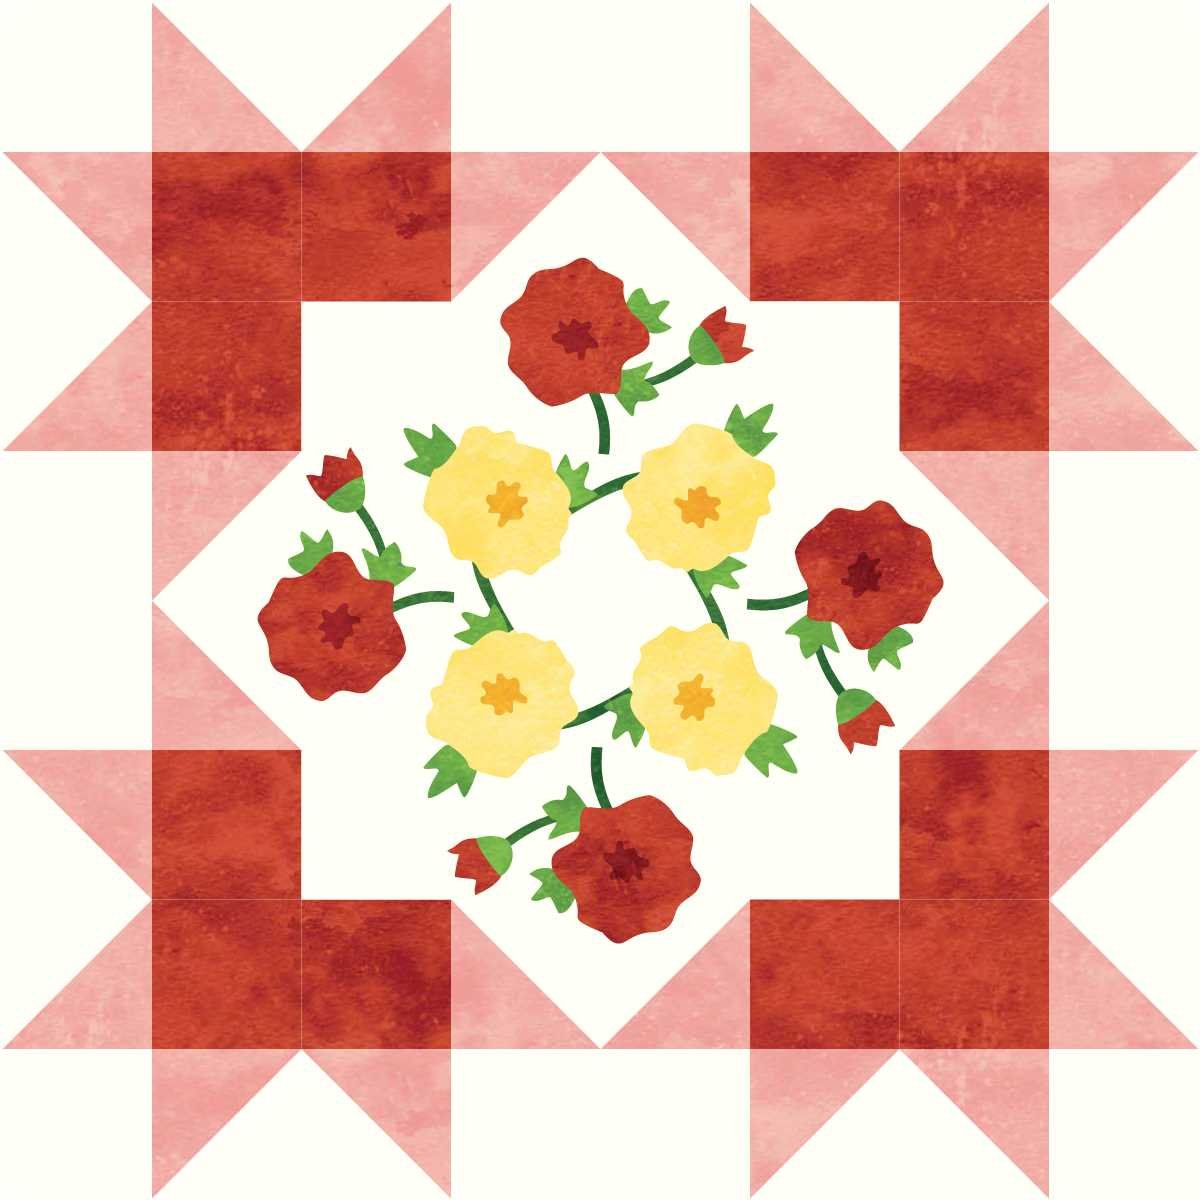 Starburst Blossoms Block 7: Two Roses